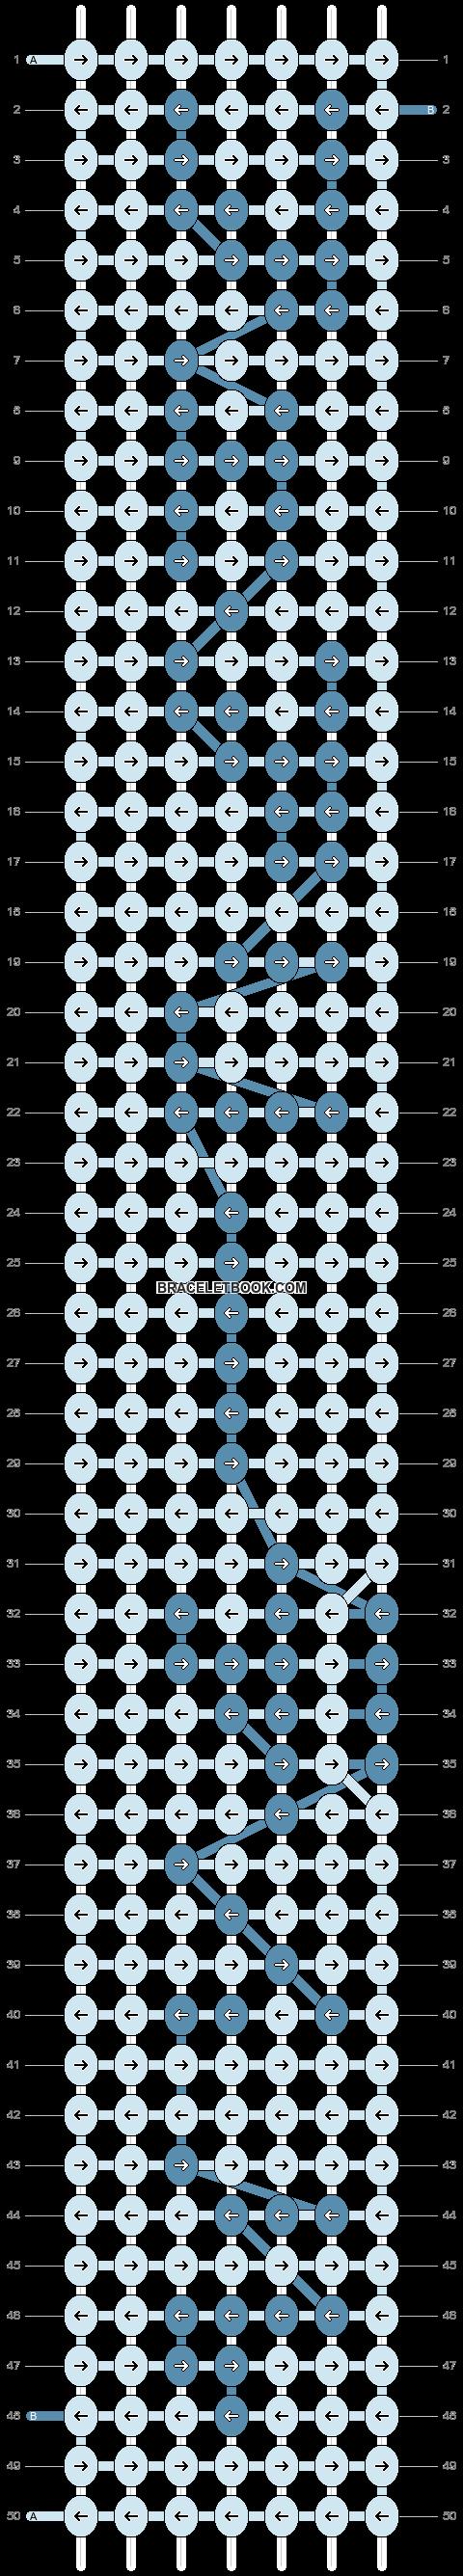 Alpha pattern #15621 pattern